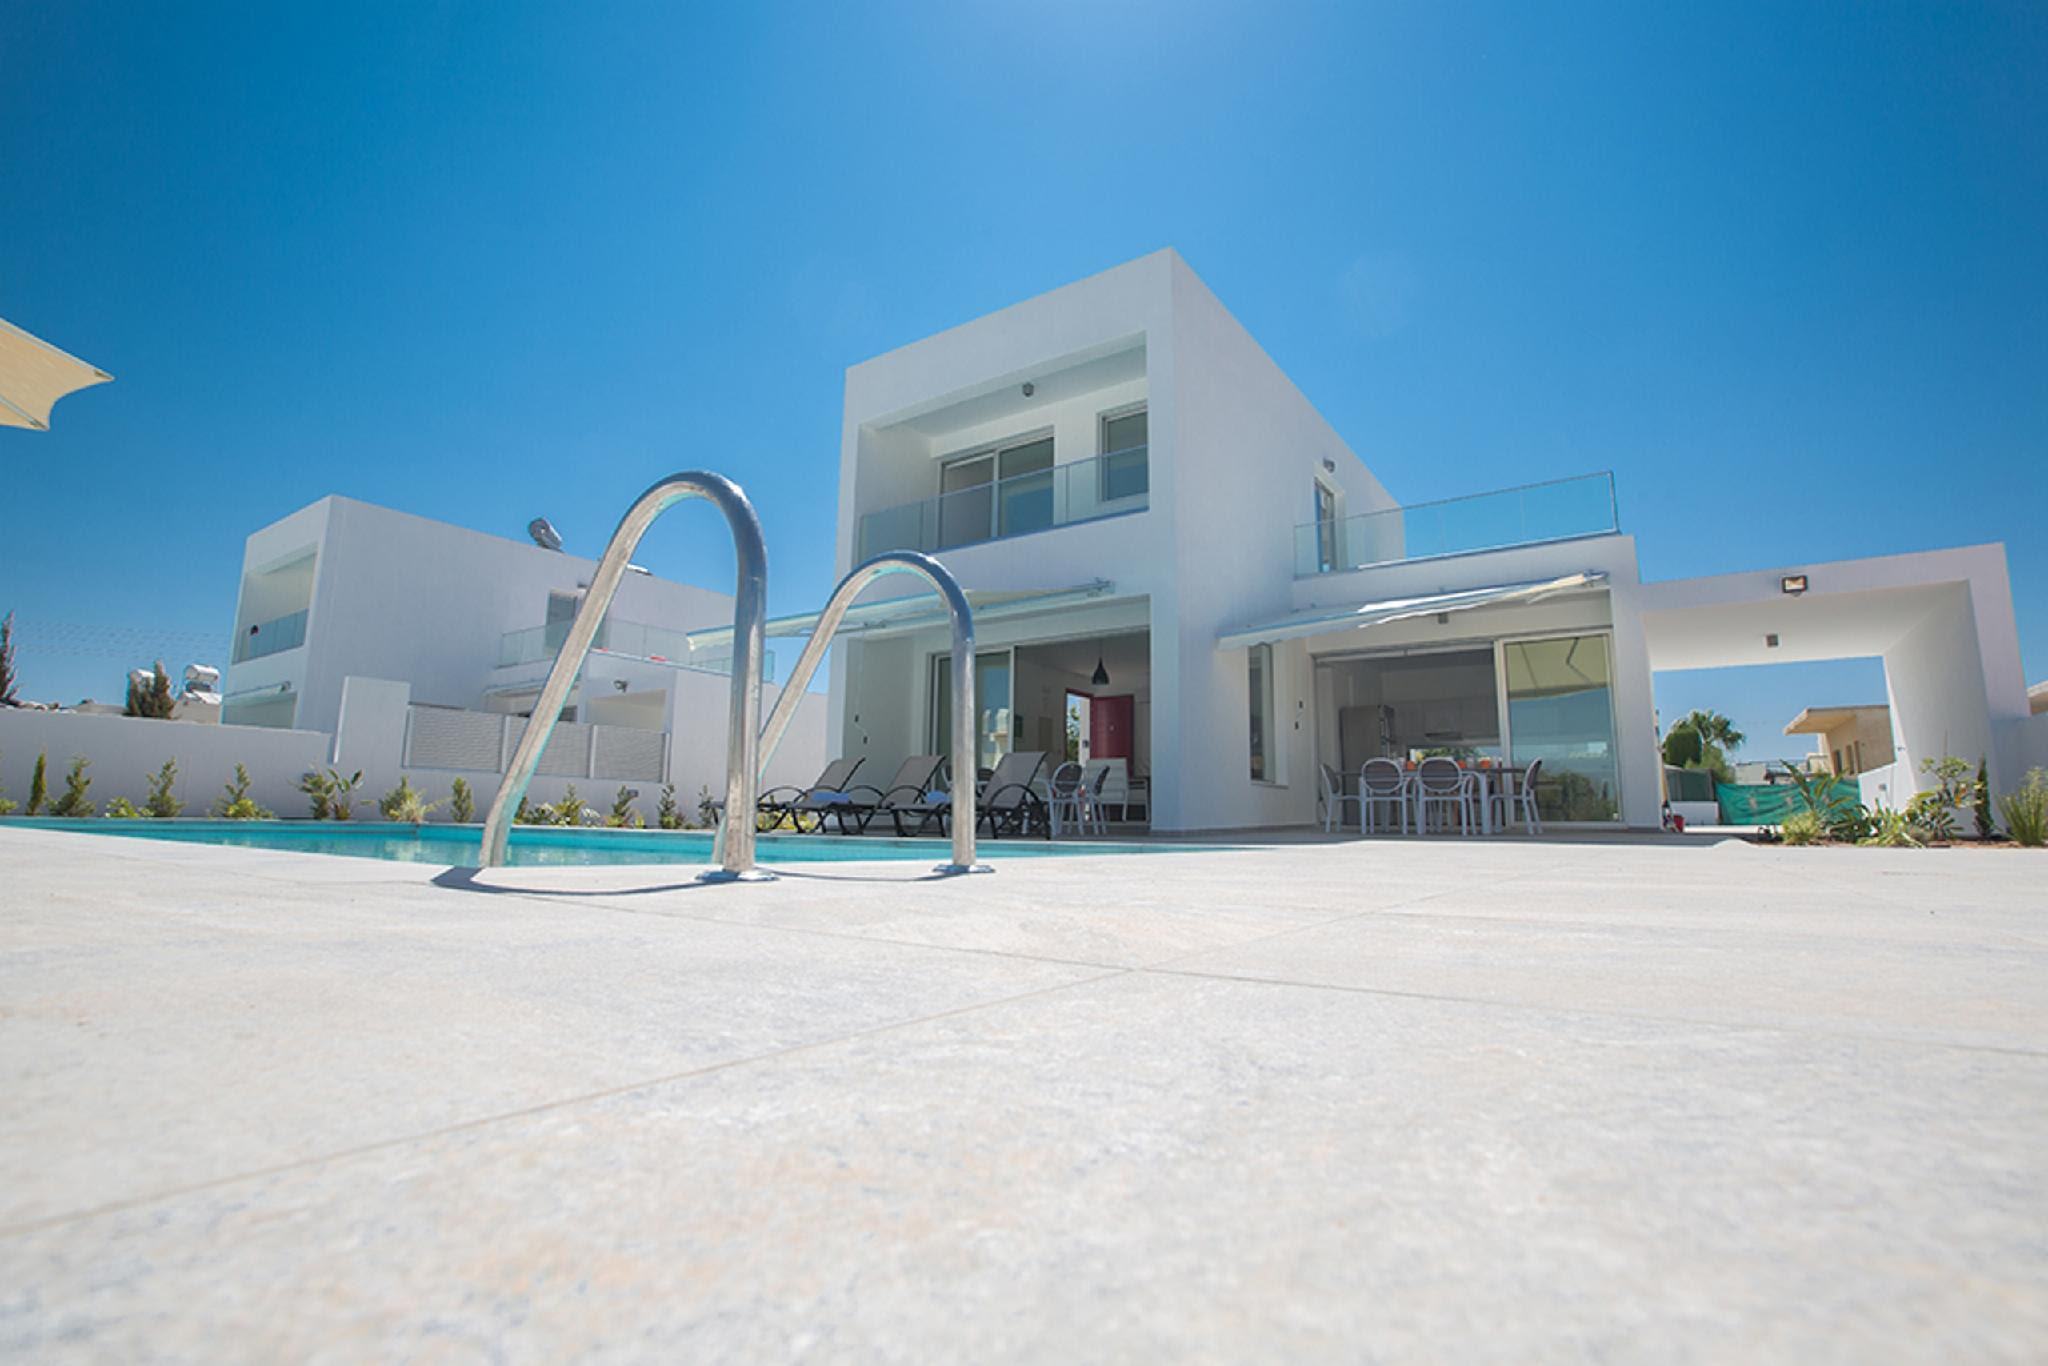 Cyprus In The Sun Villa CCV1 Platinum 5 Bedrooms  Reviews